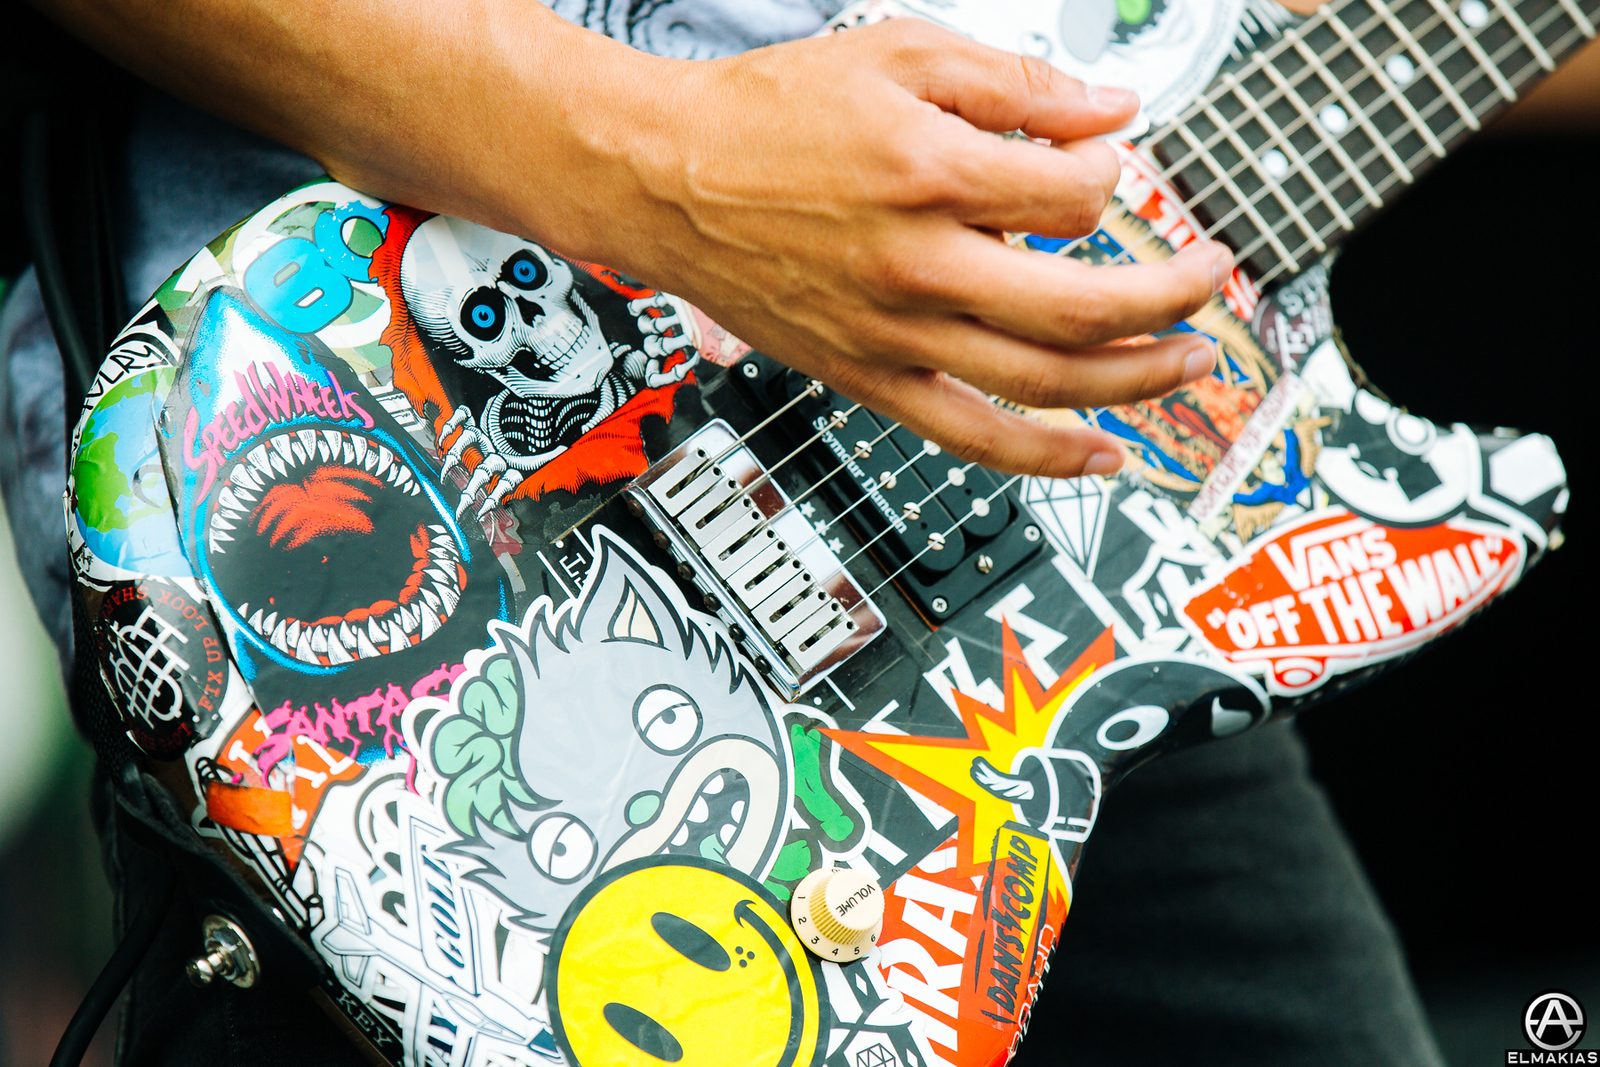 Vic Fuentes of Pierce the Veil's guitar at Warped Tour 2015 by Adam Elmakias